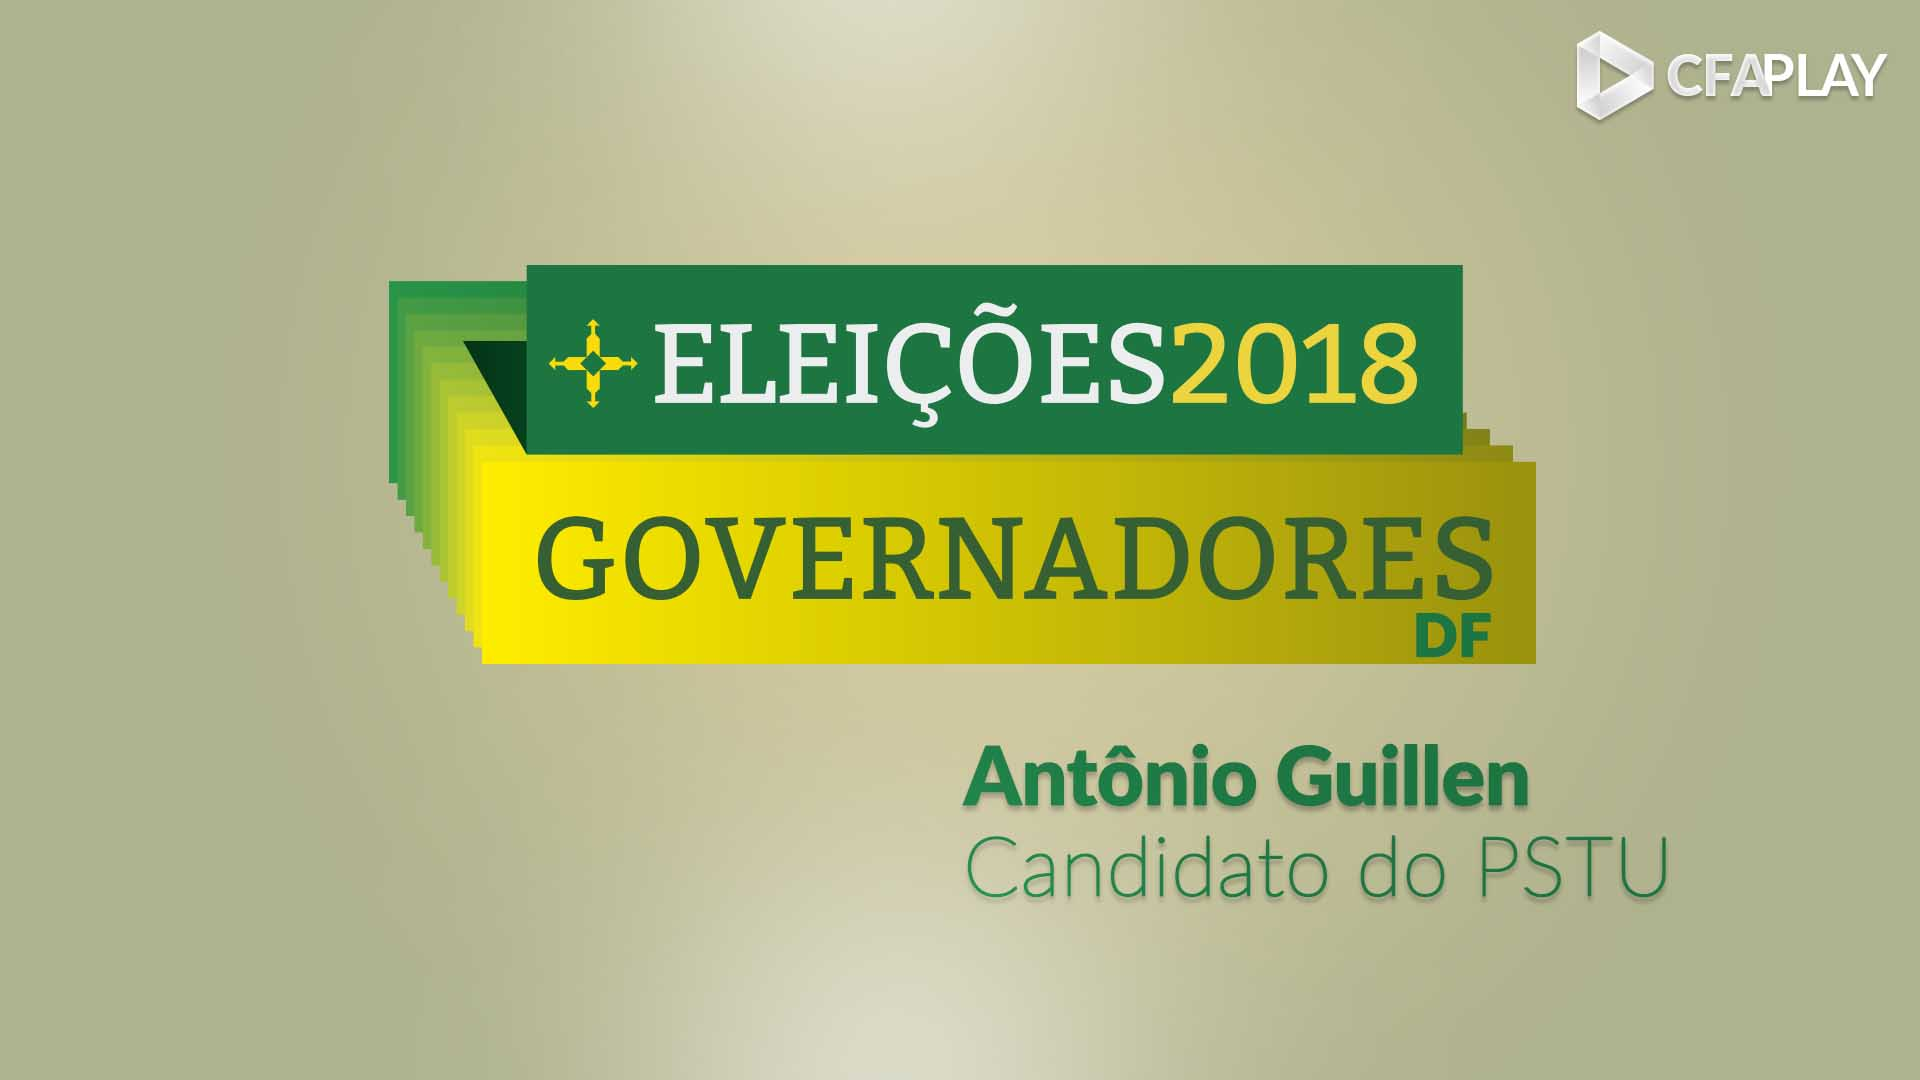 Governadores GDF 2018: Análise do candidato Antônio Guillen (PSTU)